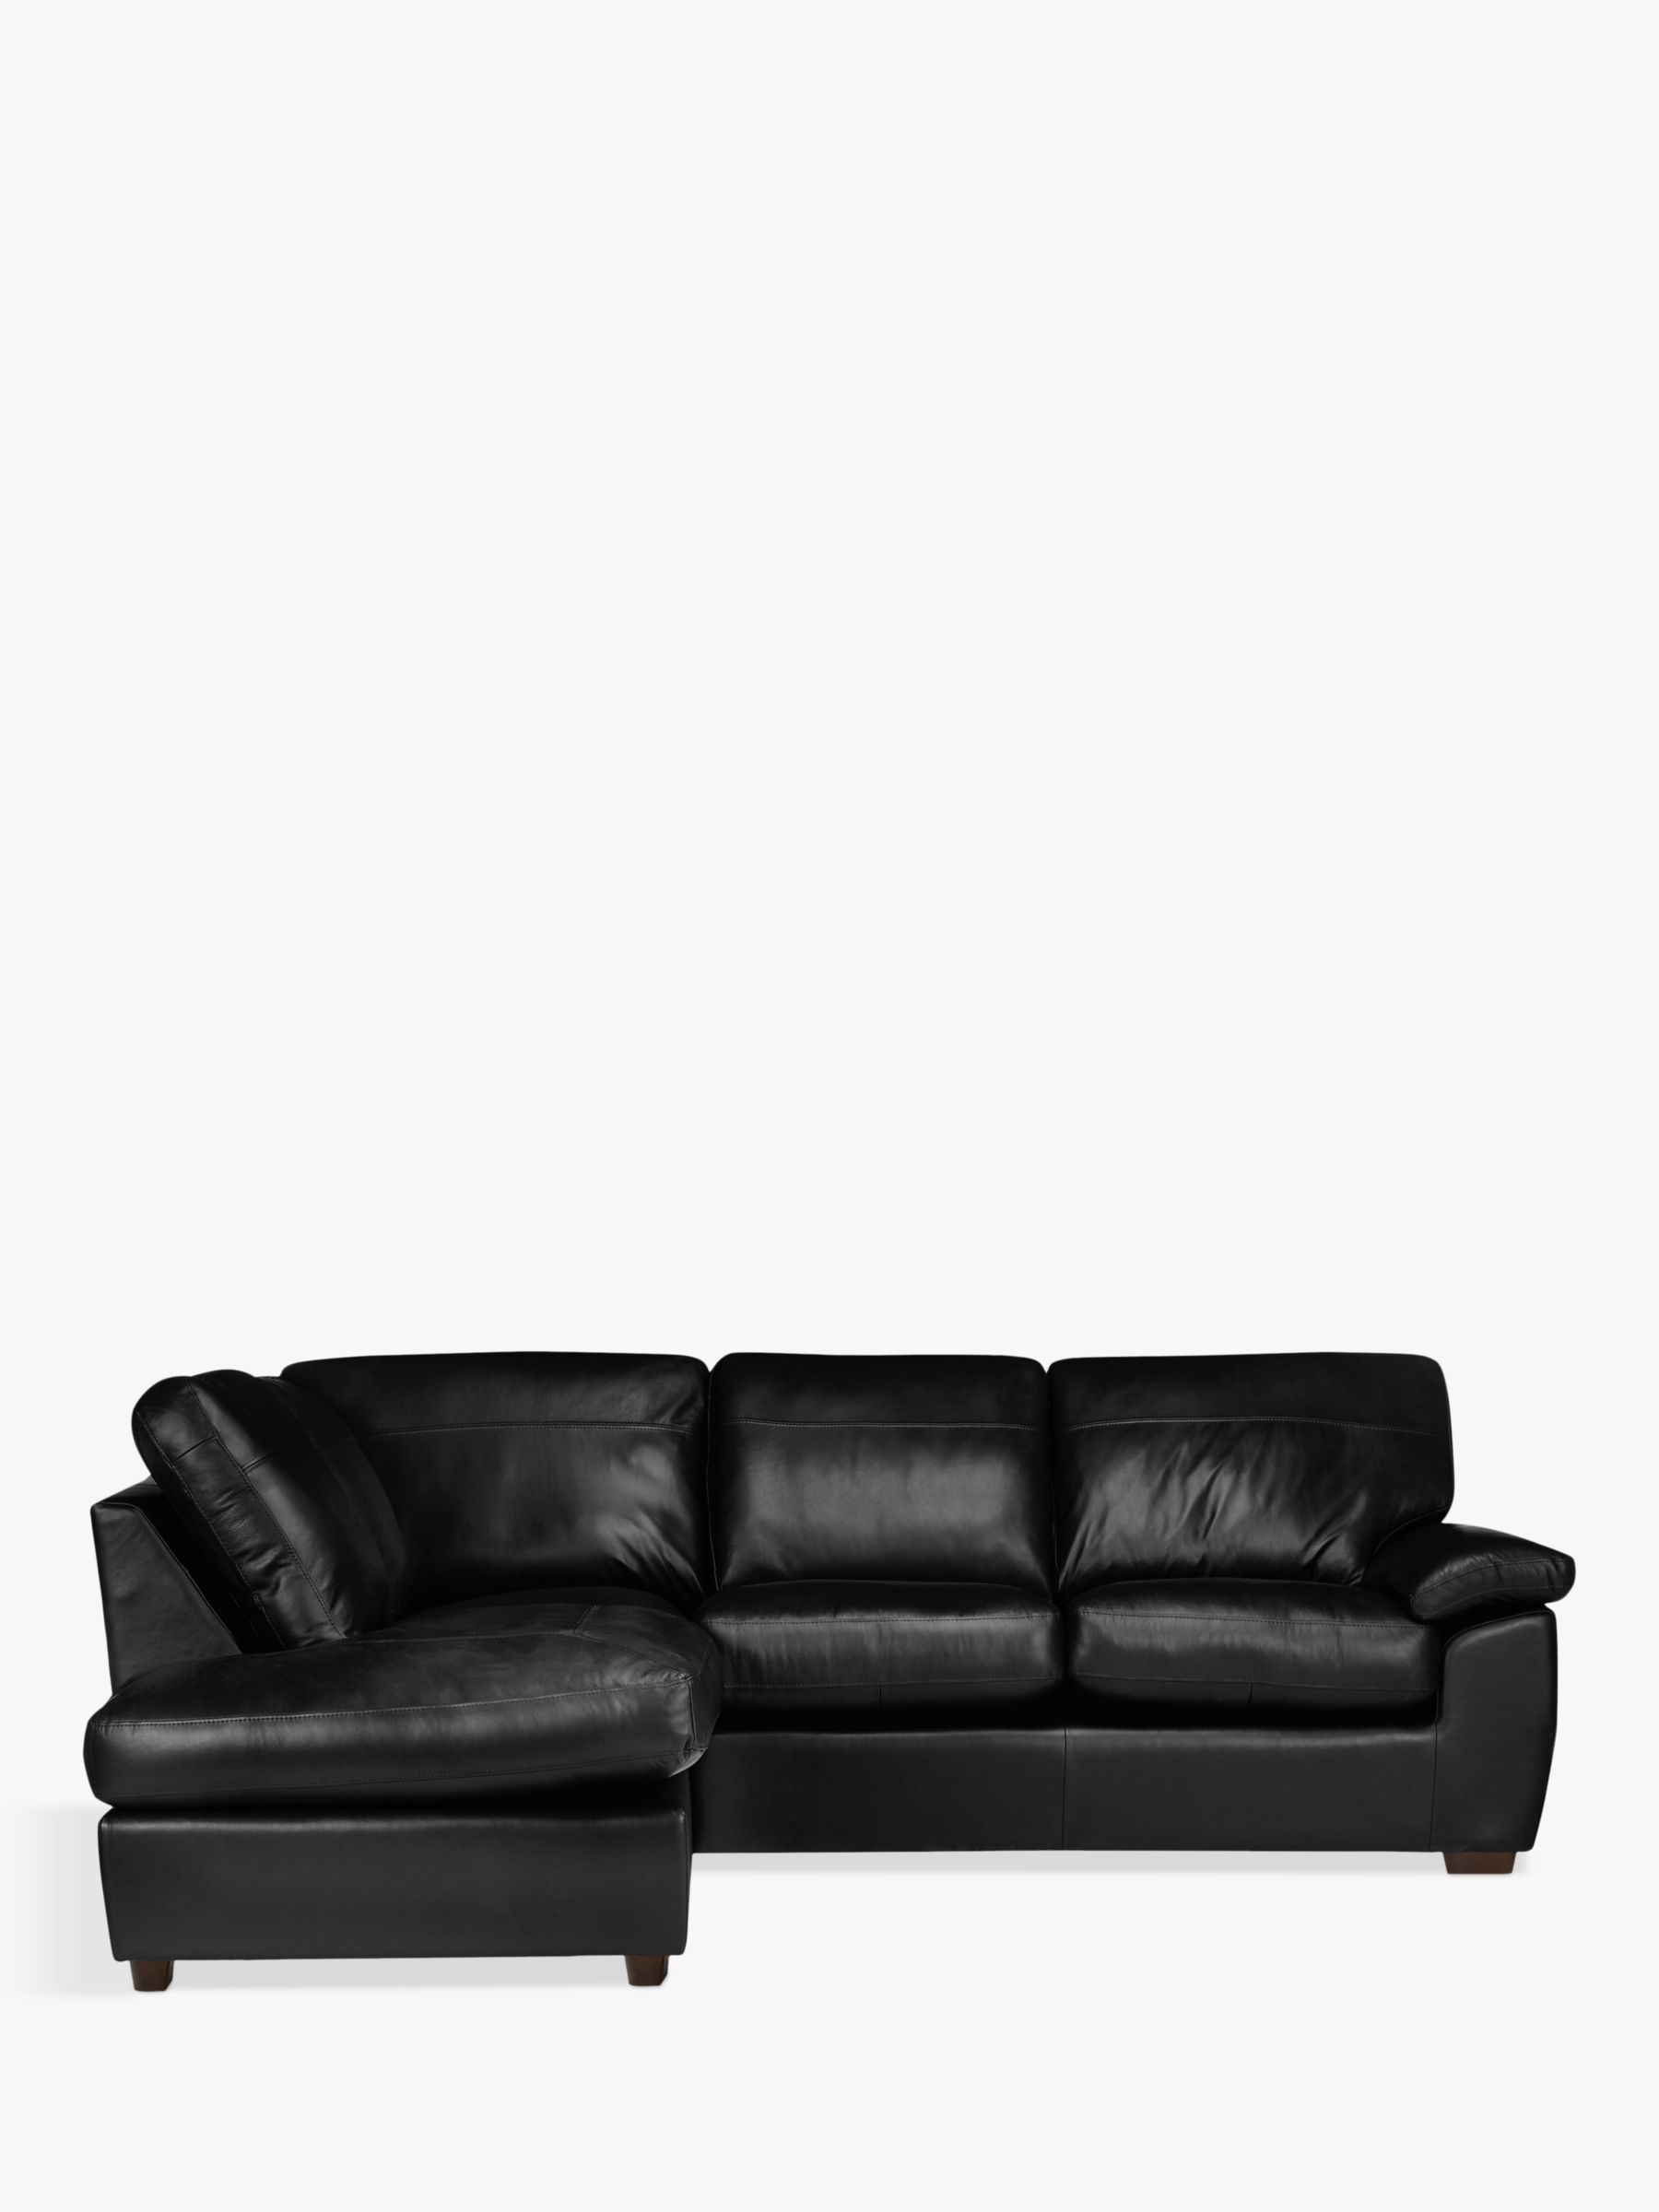 camden sofa john lewis billige online bestellen and partners leather lhf chaise corner end